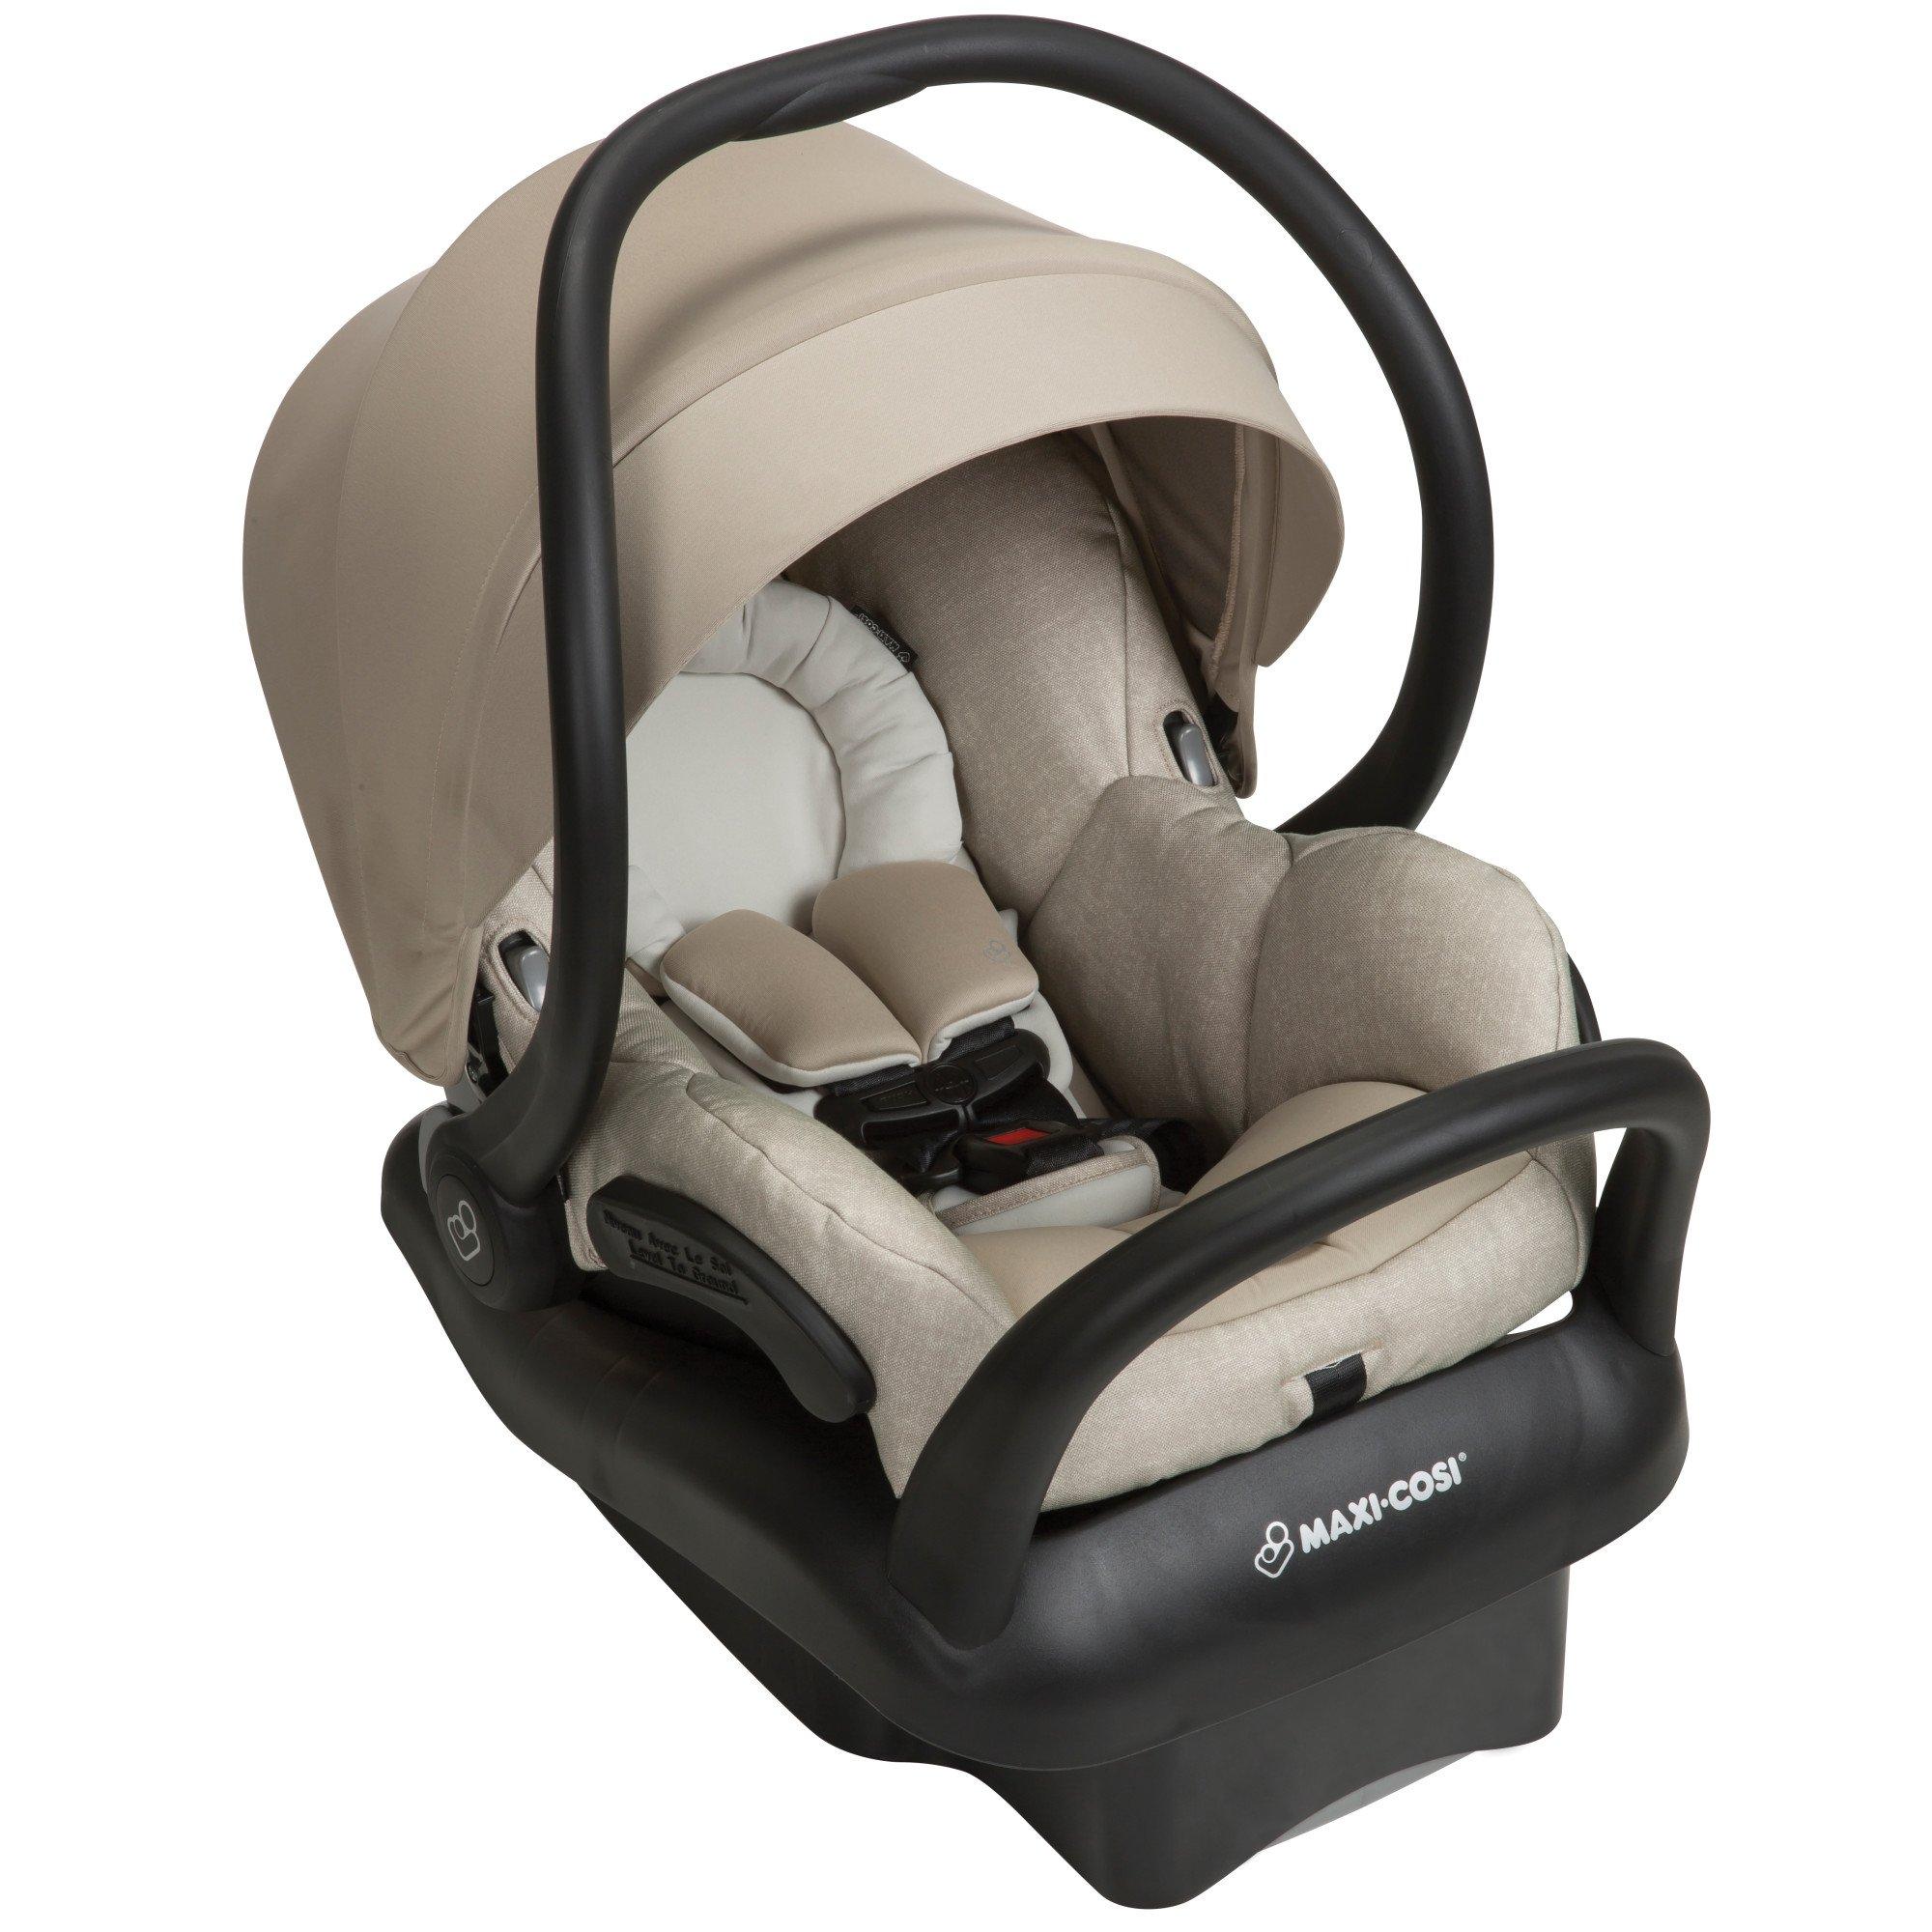 Amazon.com : Maxi-Cosi Adorra Modular Stroller, Nomad Sand : Baby